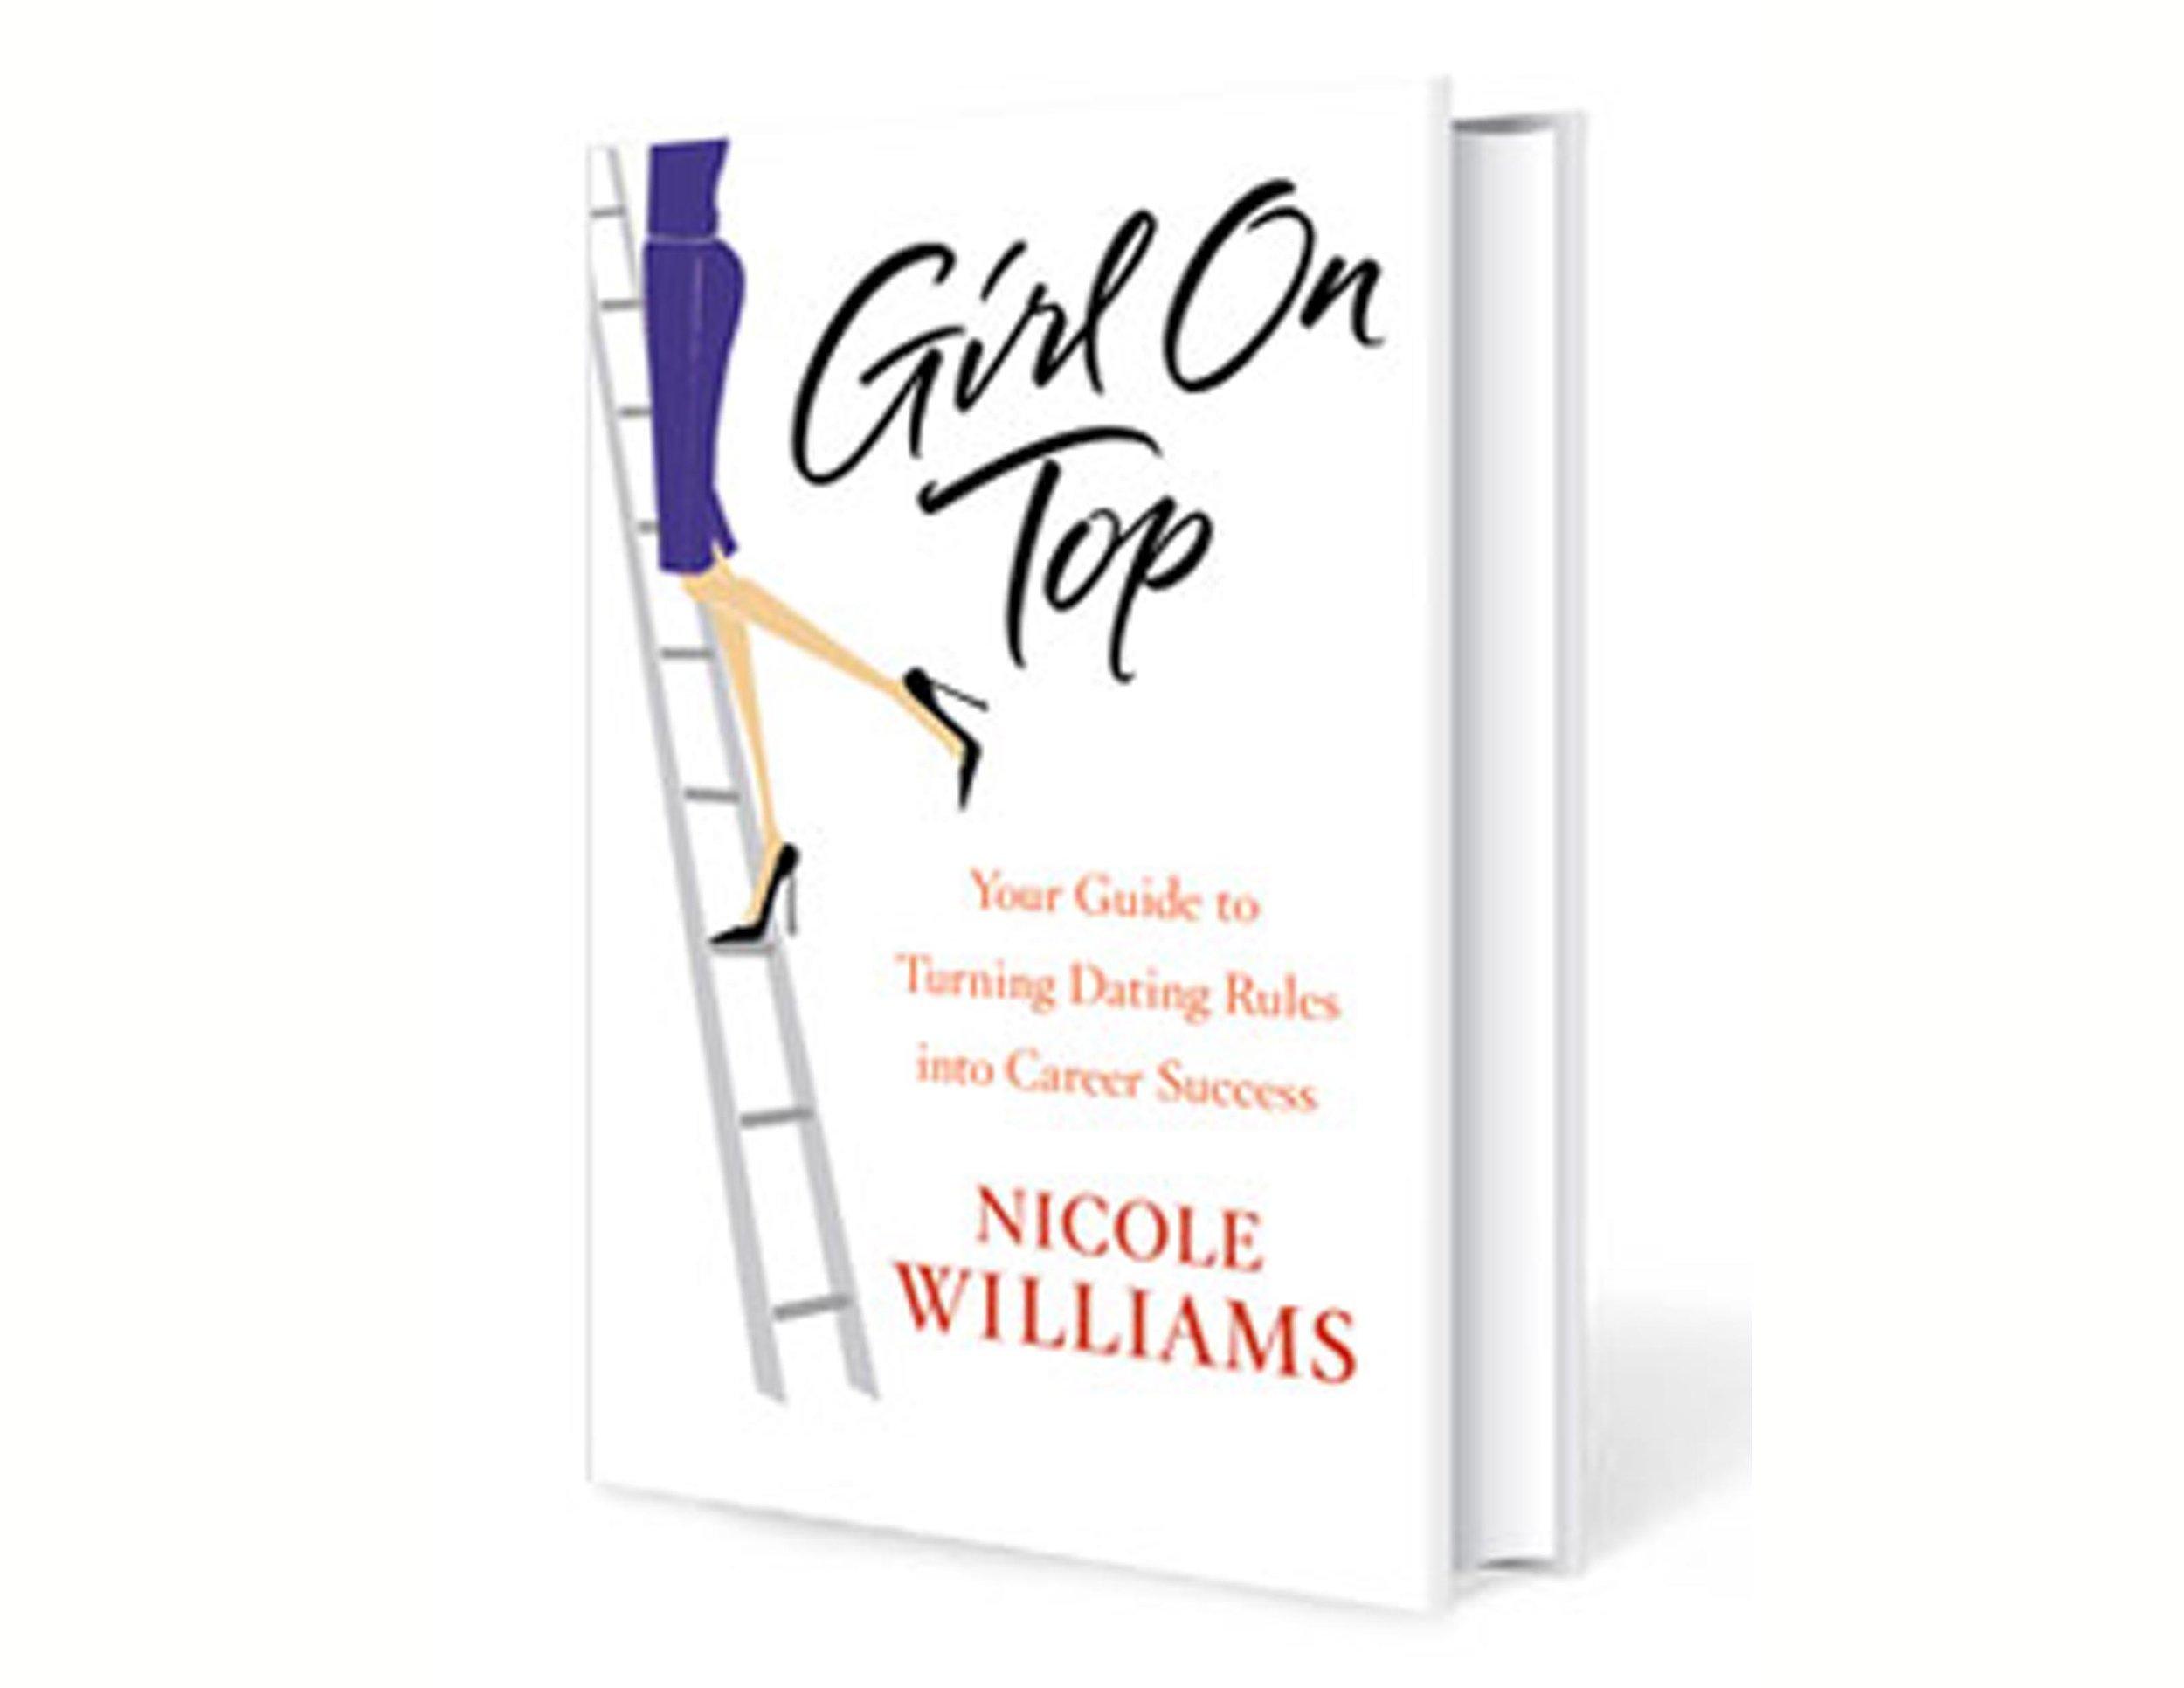 Chamberlin-web-Girl on top0.jpg